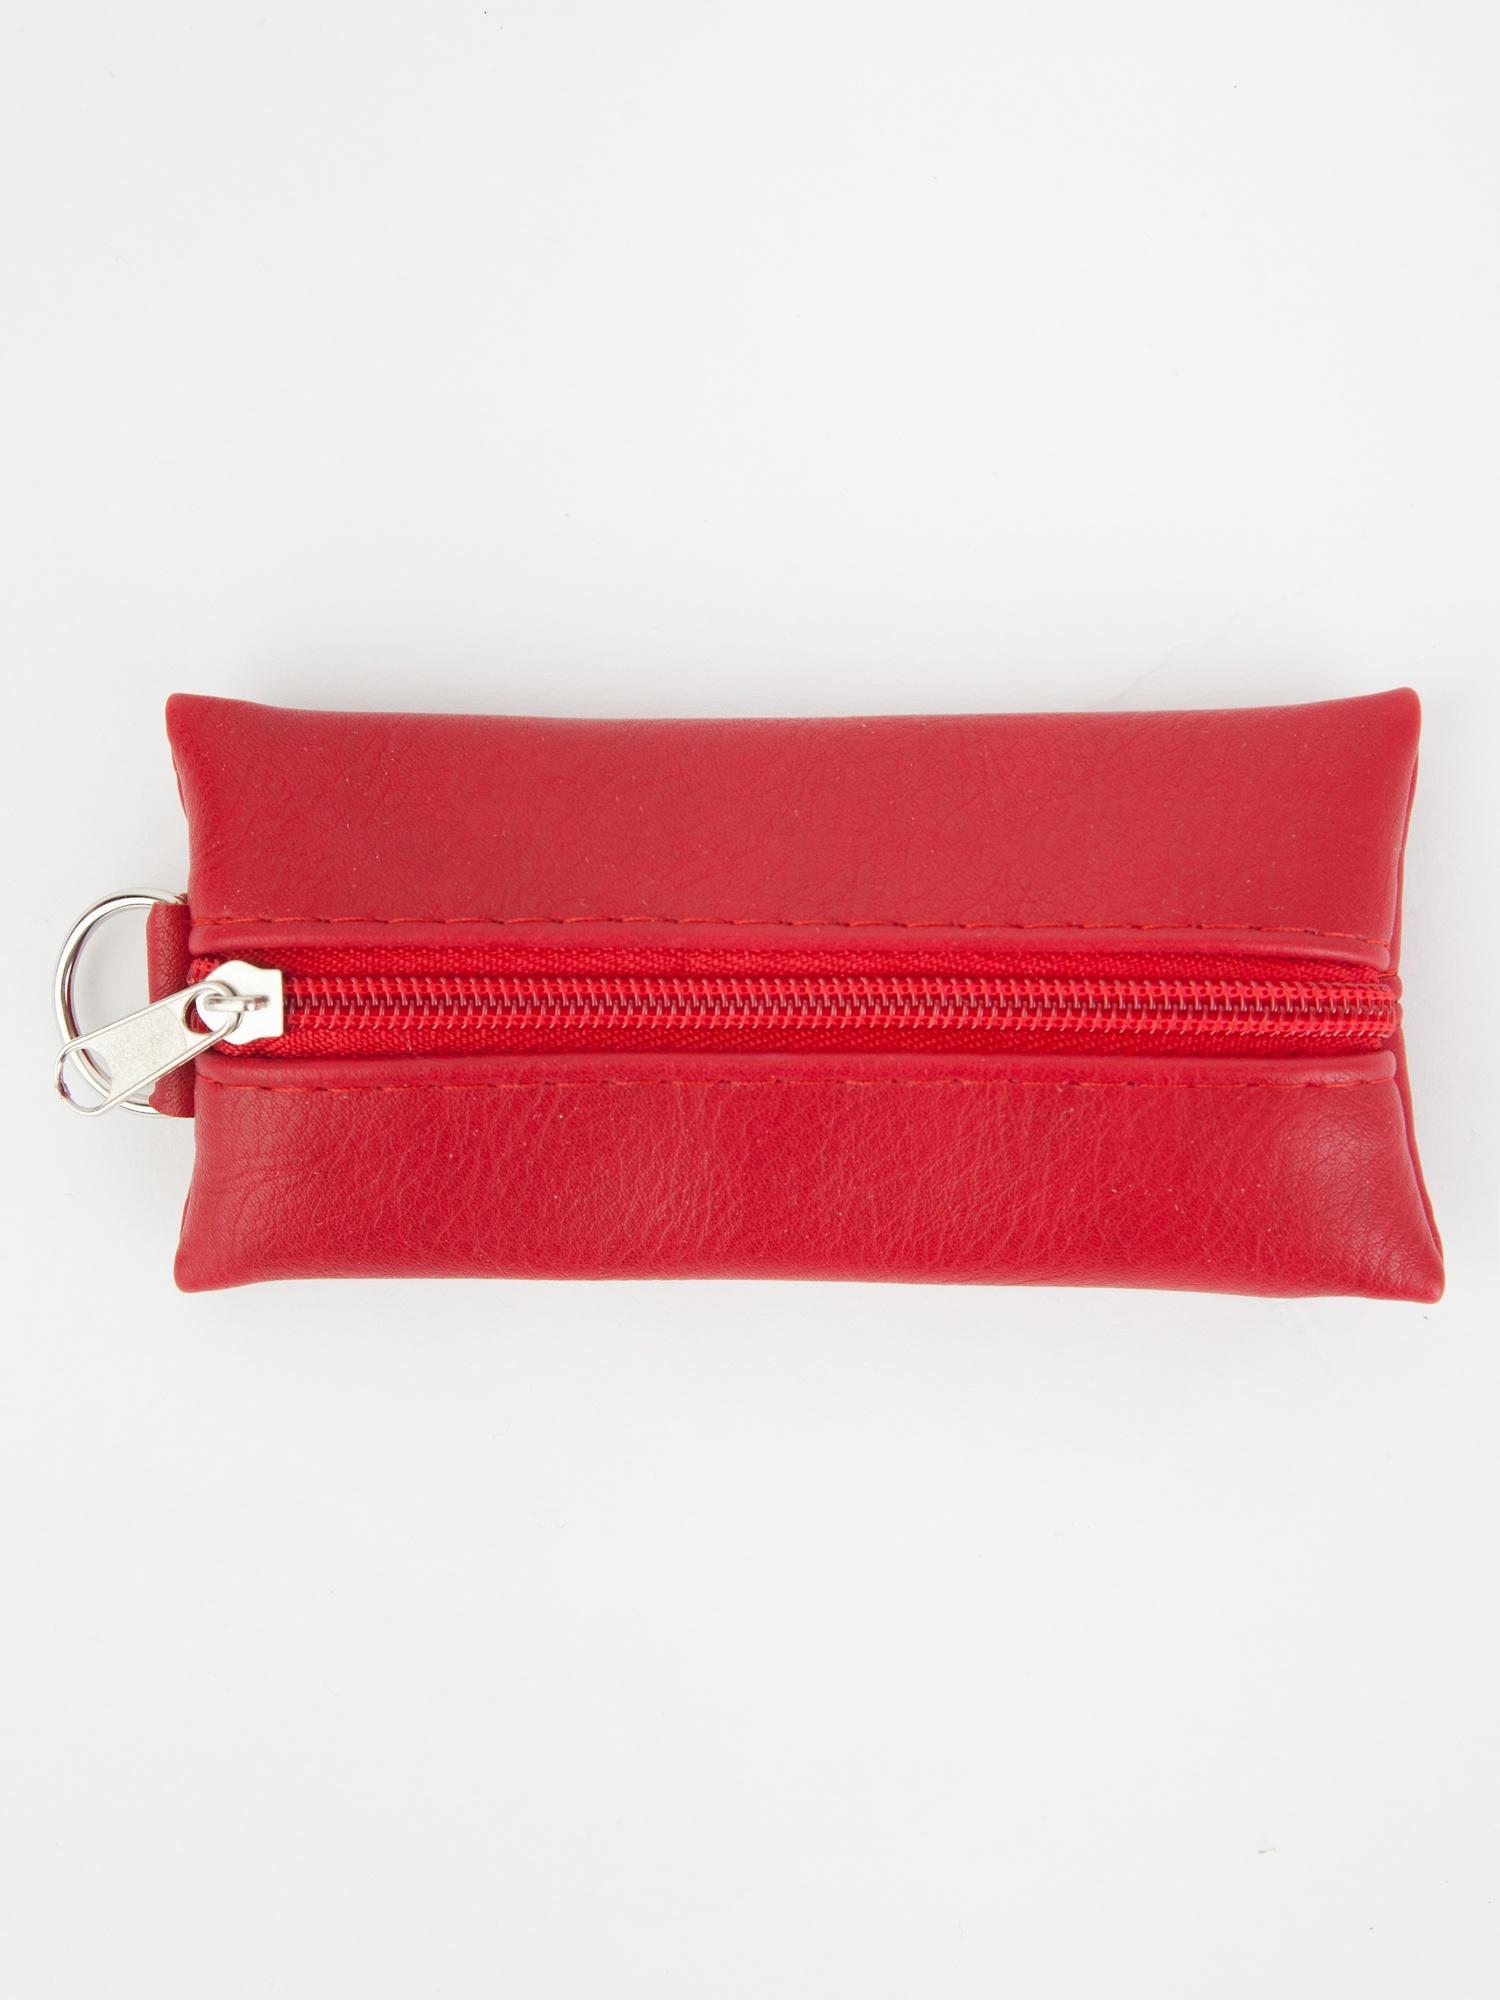 Ключница Мастер Дизайн 002-RED/, 002-RED/, красный ключница мастер дизайн 002 red lac 002 red lac красный